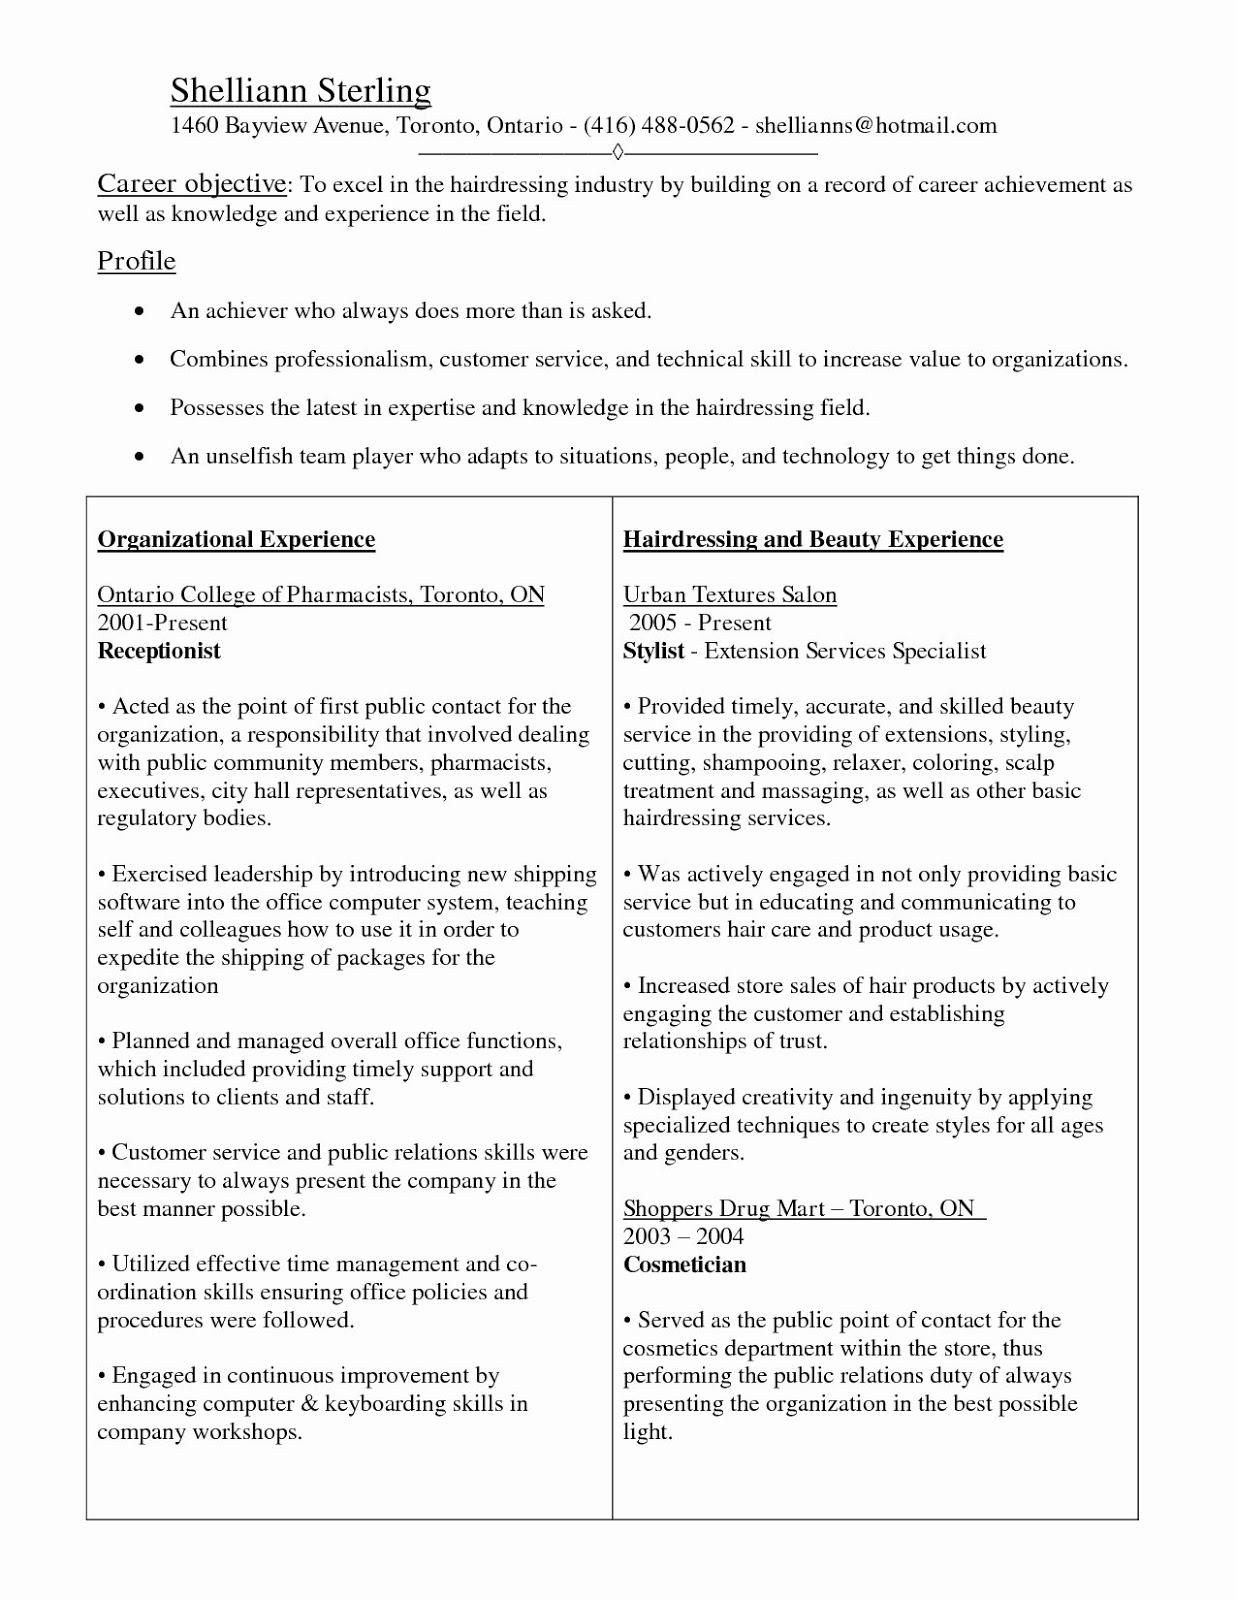 esthetician resume example, esthetician resume examples no experience, esthetician cv examples, esthetician resume sample no experience 2019 , esthetician resume sample objective, medical esthetician resume examples,